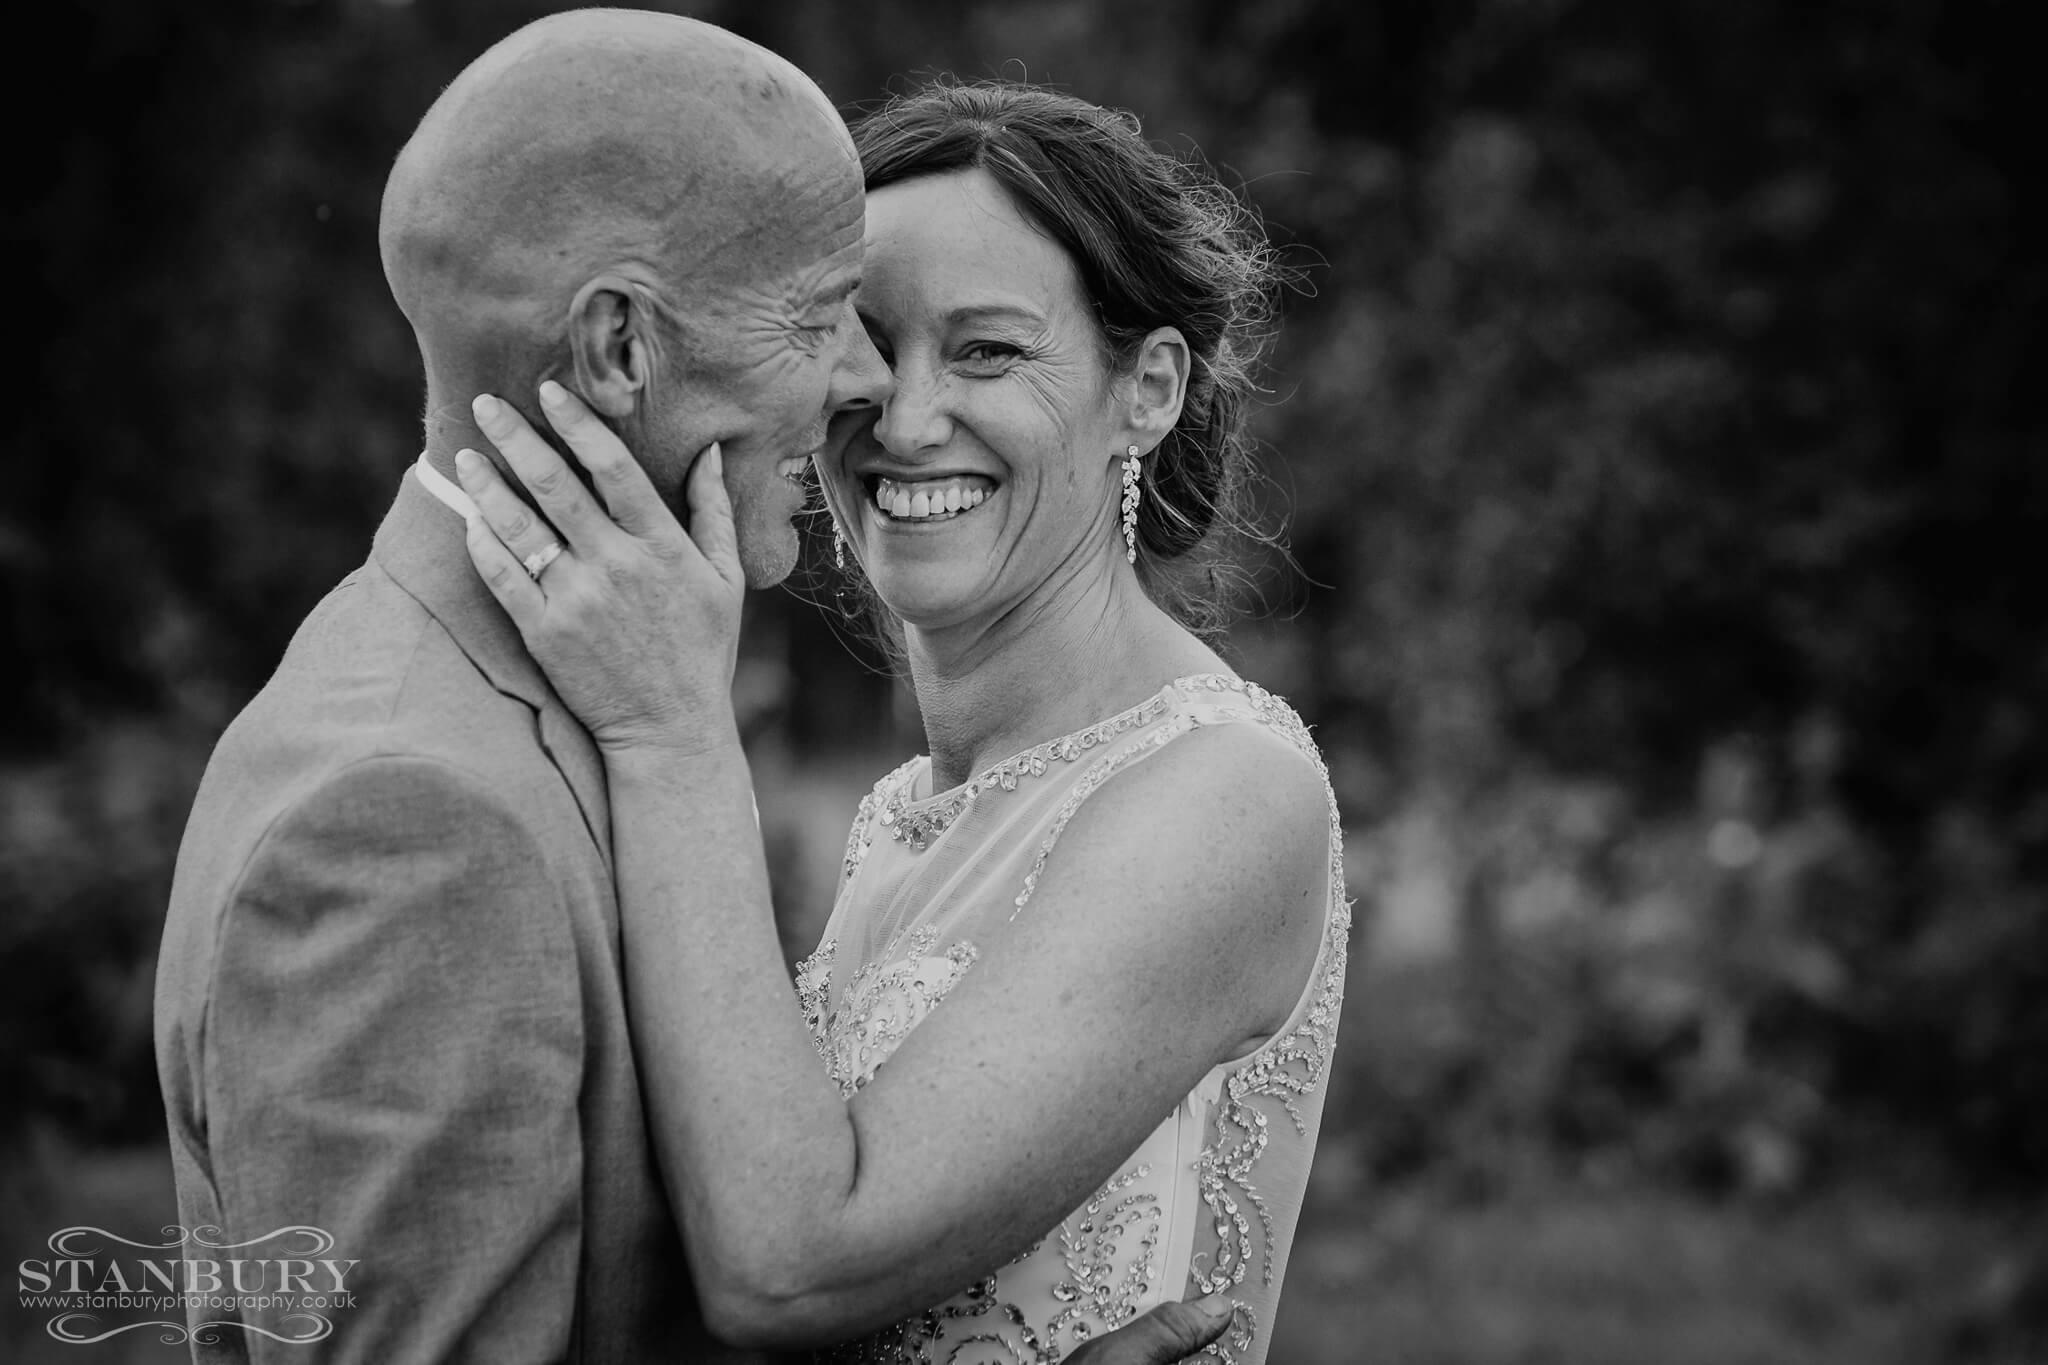 tipi-festival-bride-groom-wedding-photography-lancashire-stanbury-002